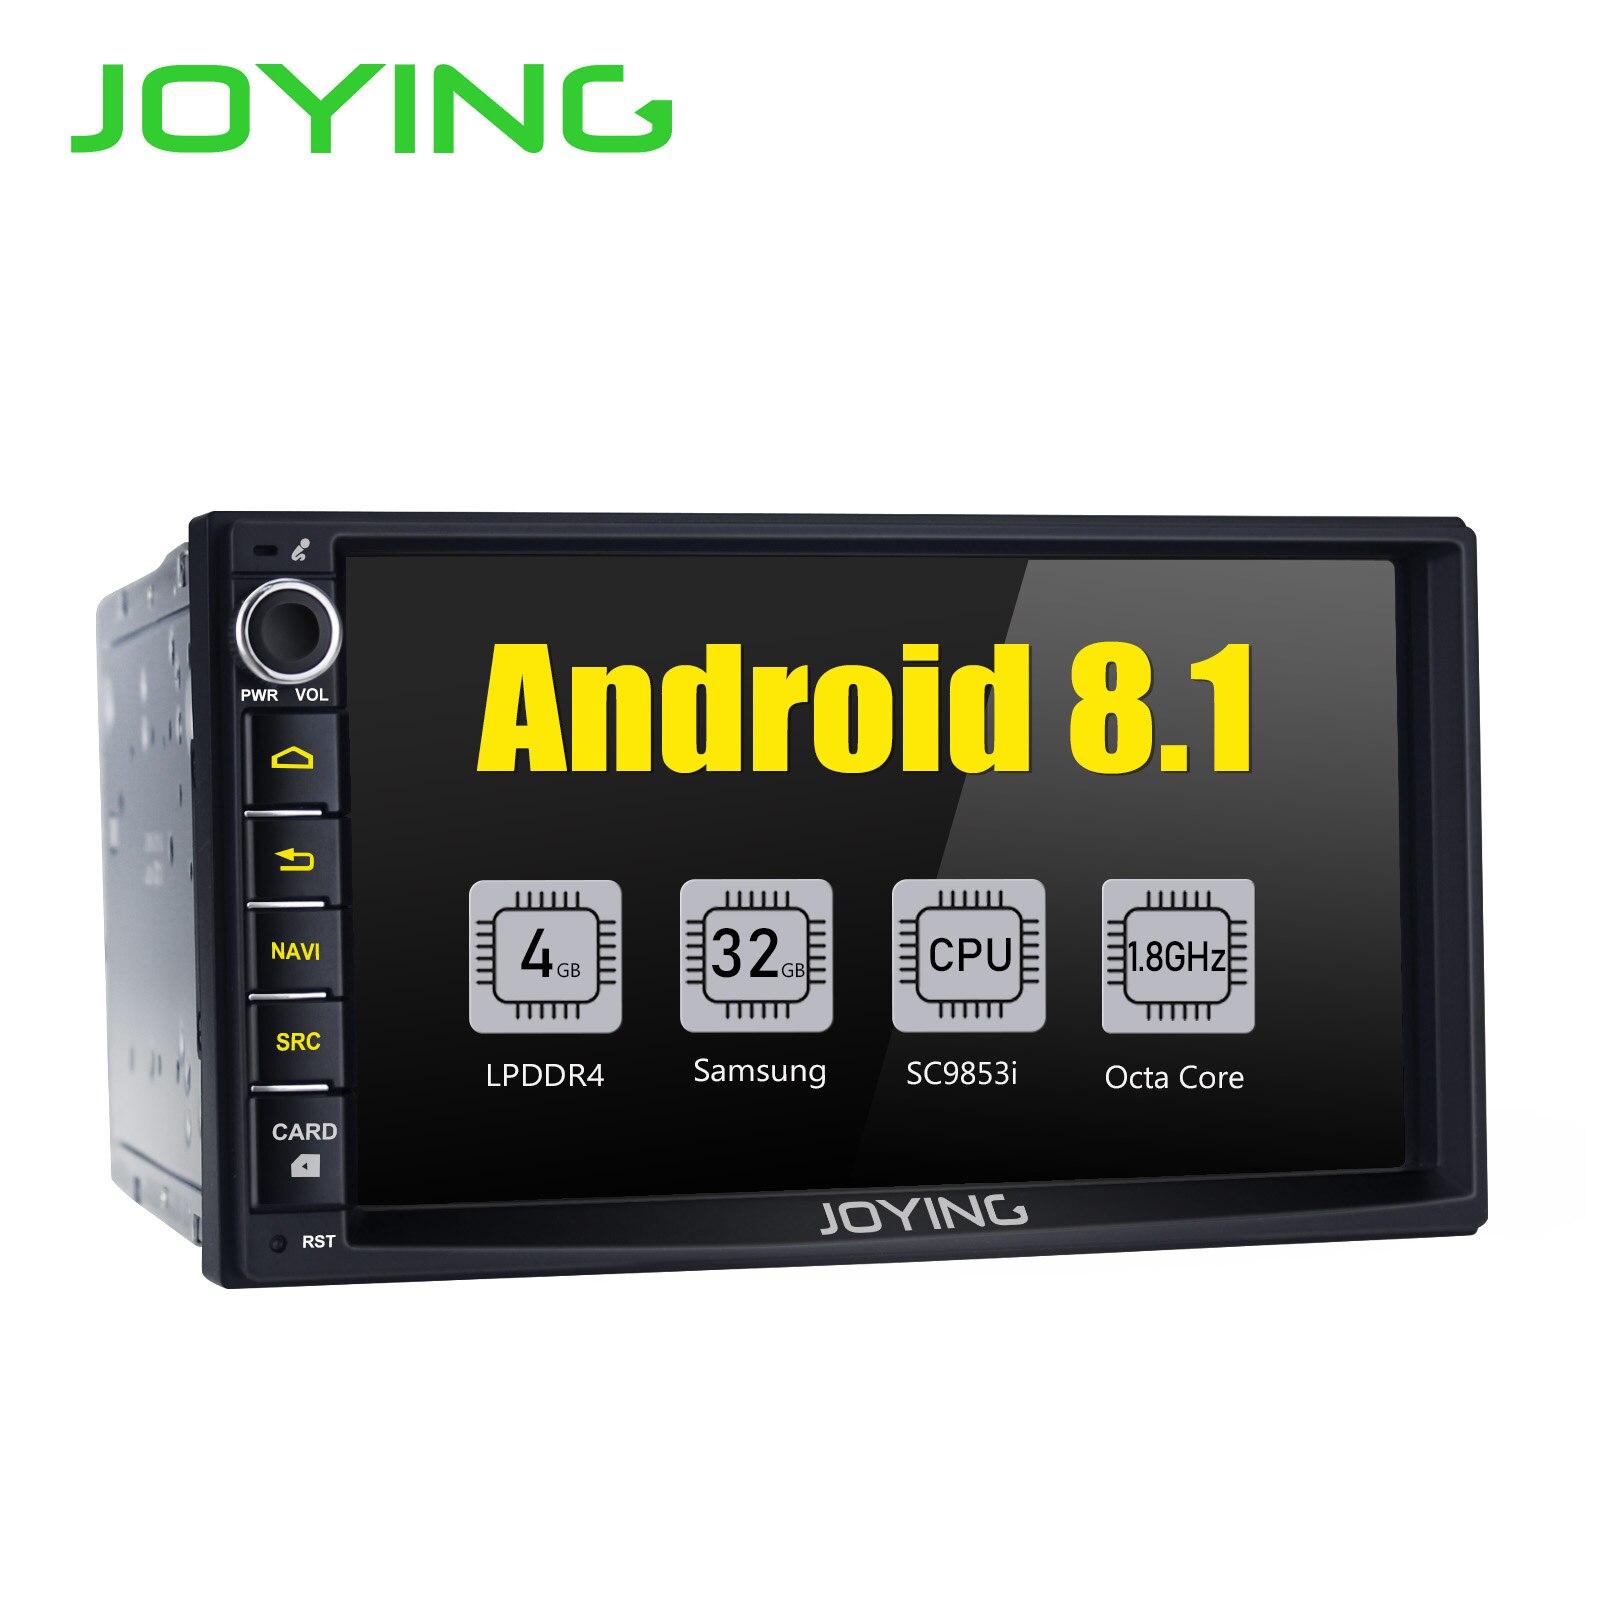 JOYING Últimas 2 Din 7 ''Android 8.1 autoradio Carro HD unidade de cabeça GPS Rádio estéreo com Intel core Octa 4G Carplay Android DSP auto